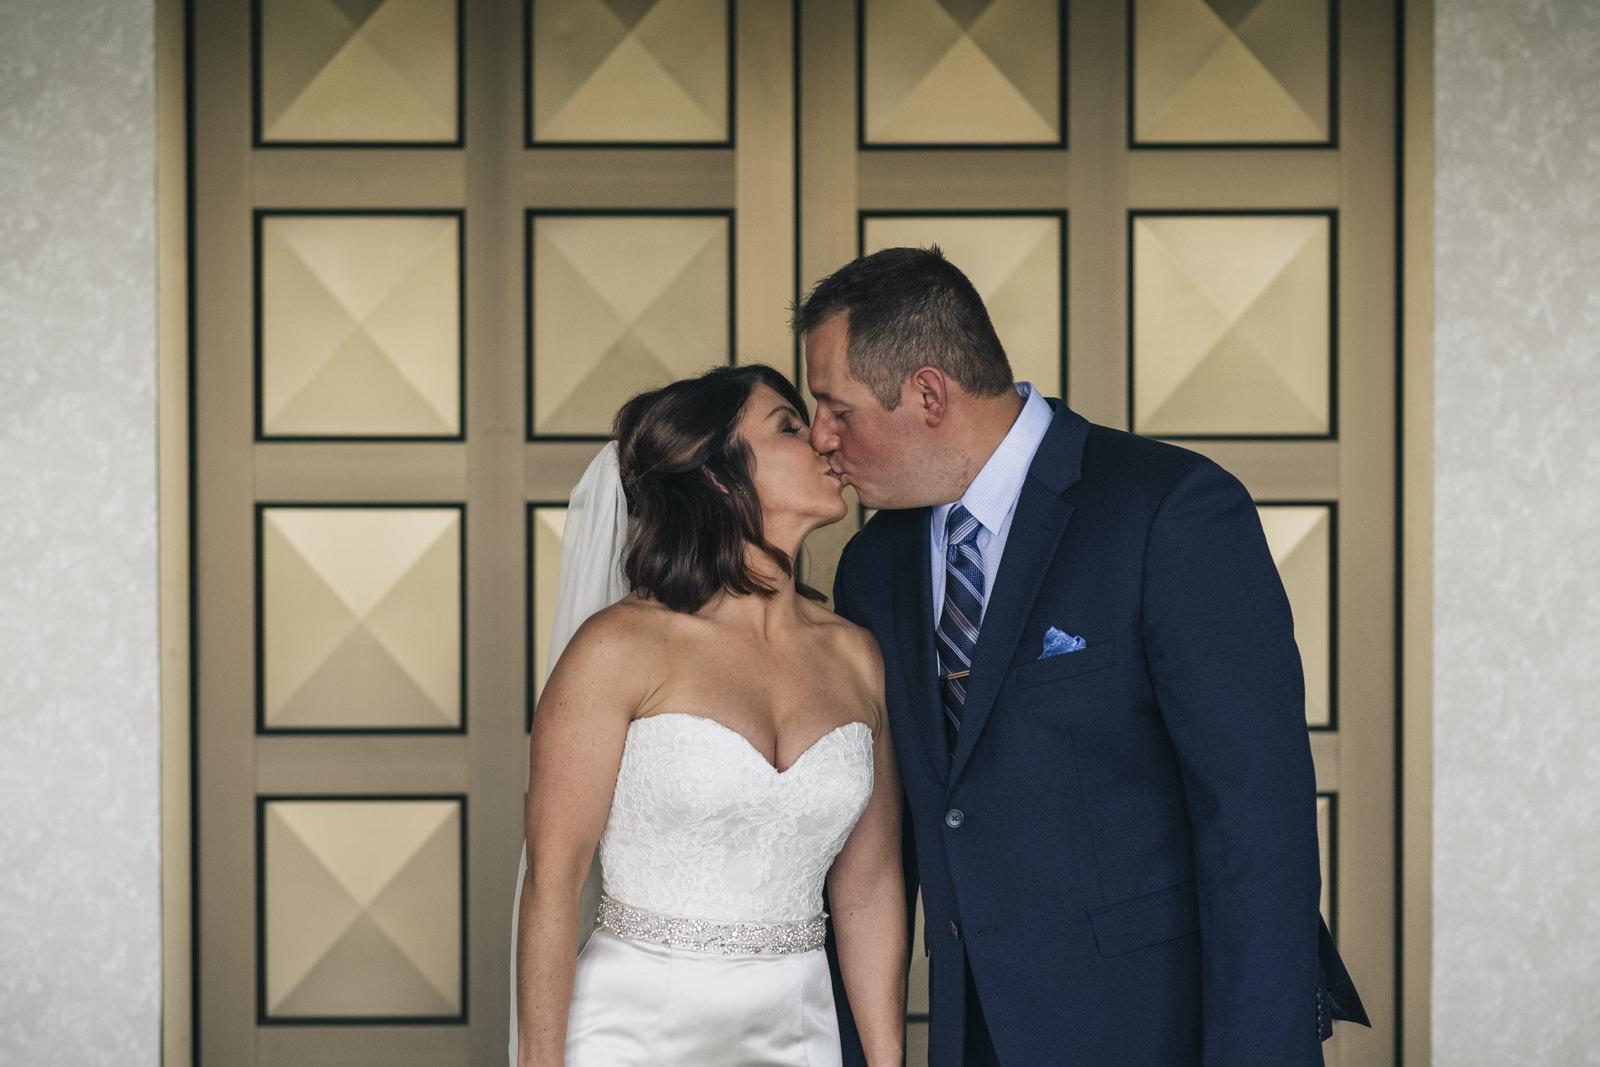 Bride and groom kiss in front of the theater doors in Toledo, Ohio.